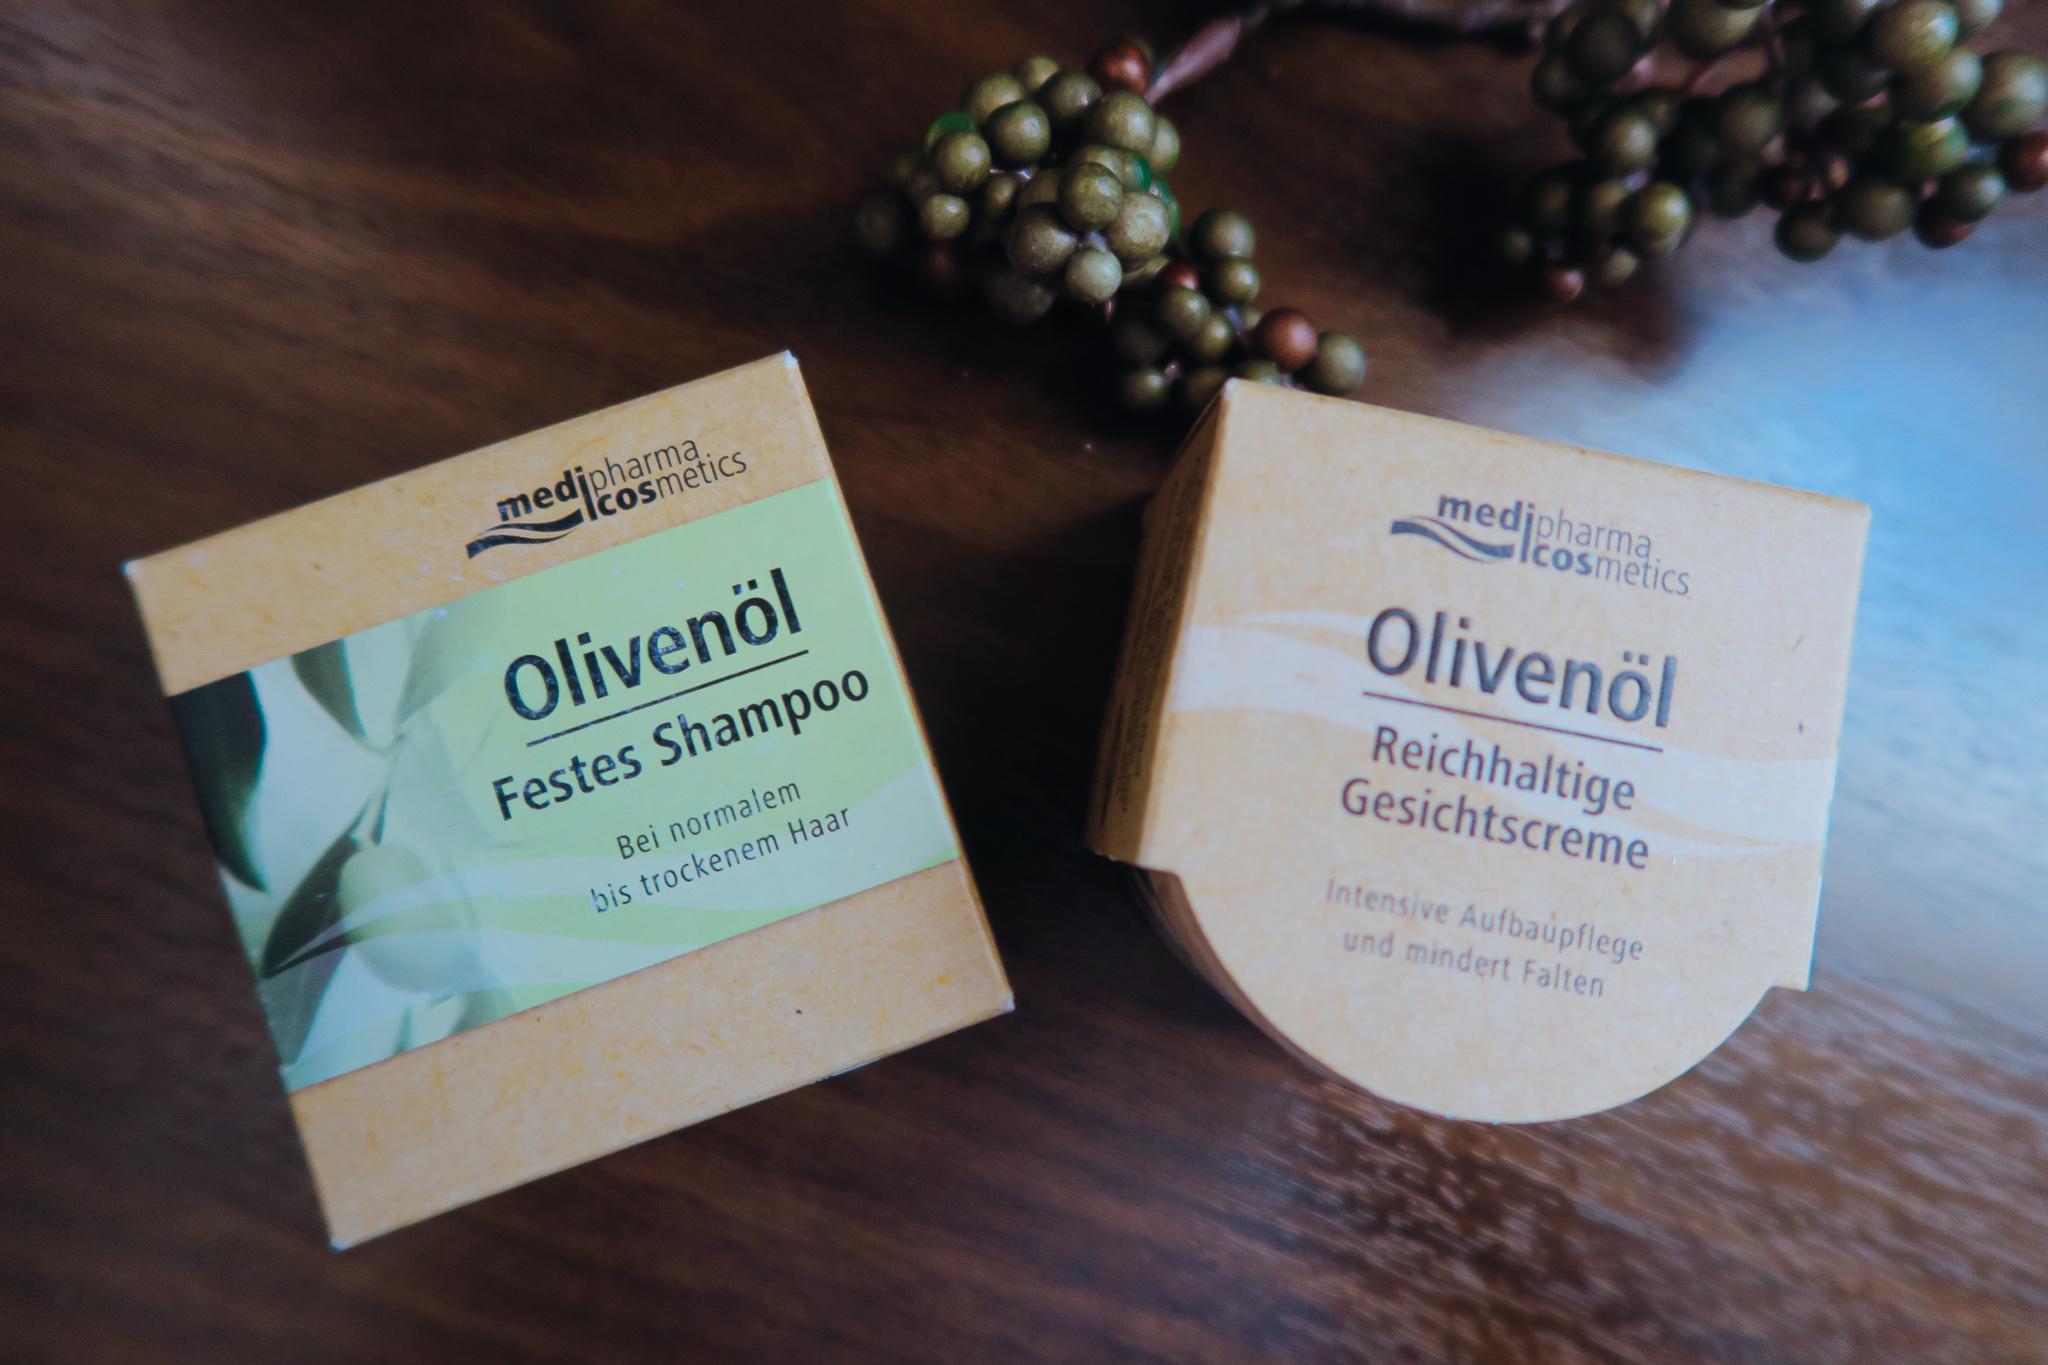 Nachhaltige Olivenöl-Pflegeserie Apotheke Bio-Olivenöl